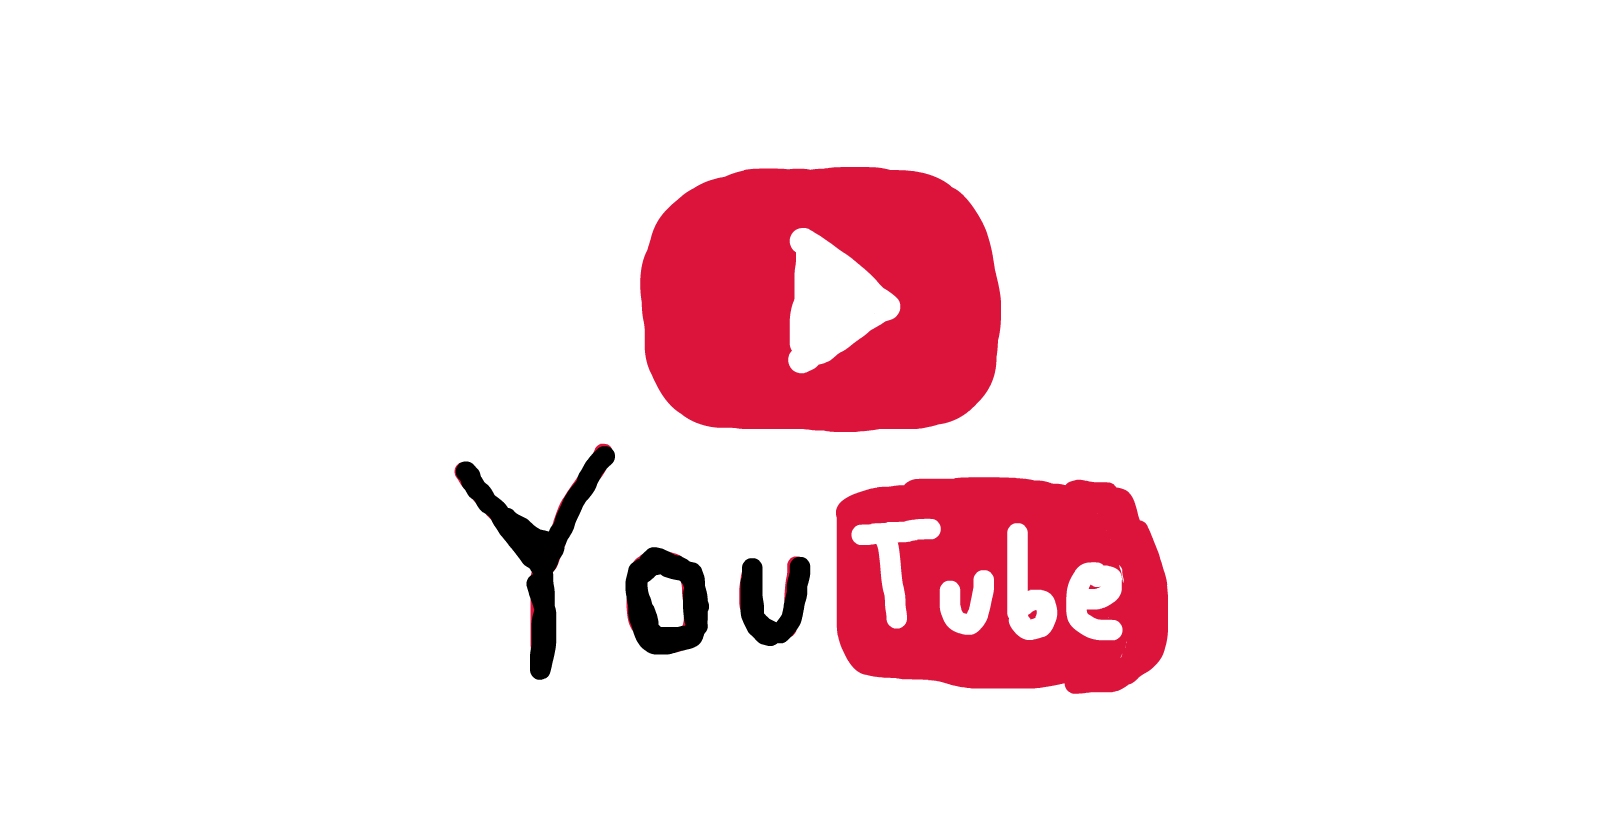 SEO για Vloggers - Συμβουλές για τη βελτιστοποίηση των βίντεο